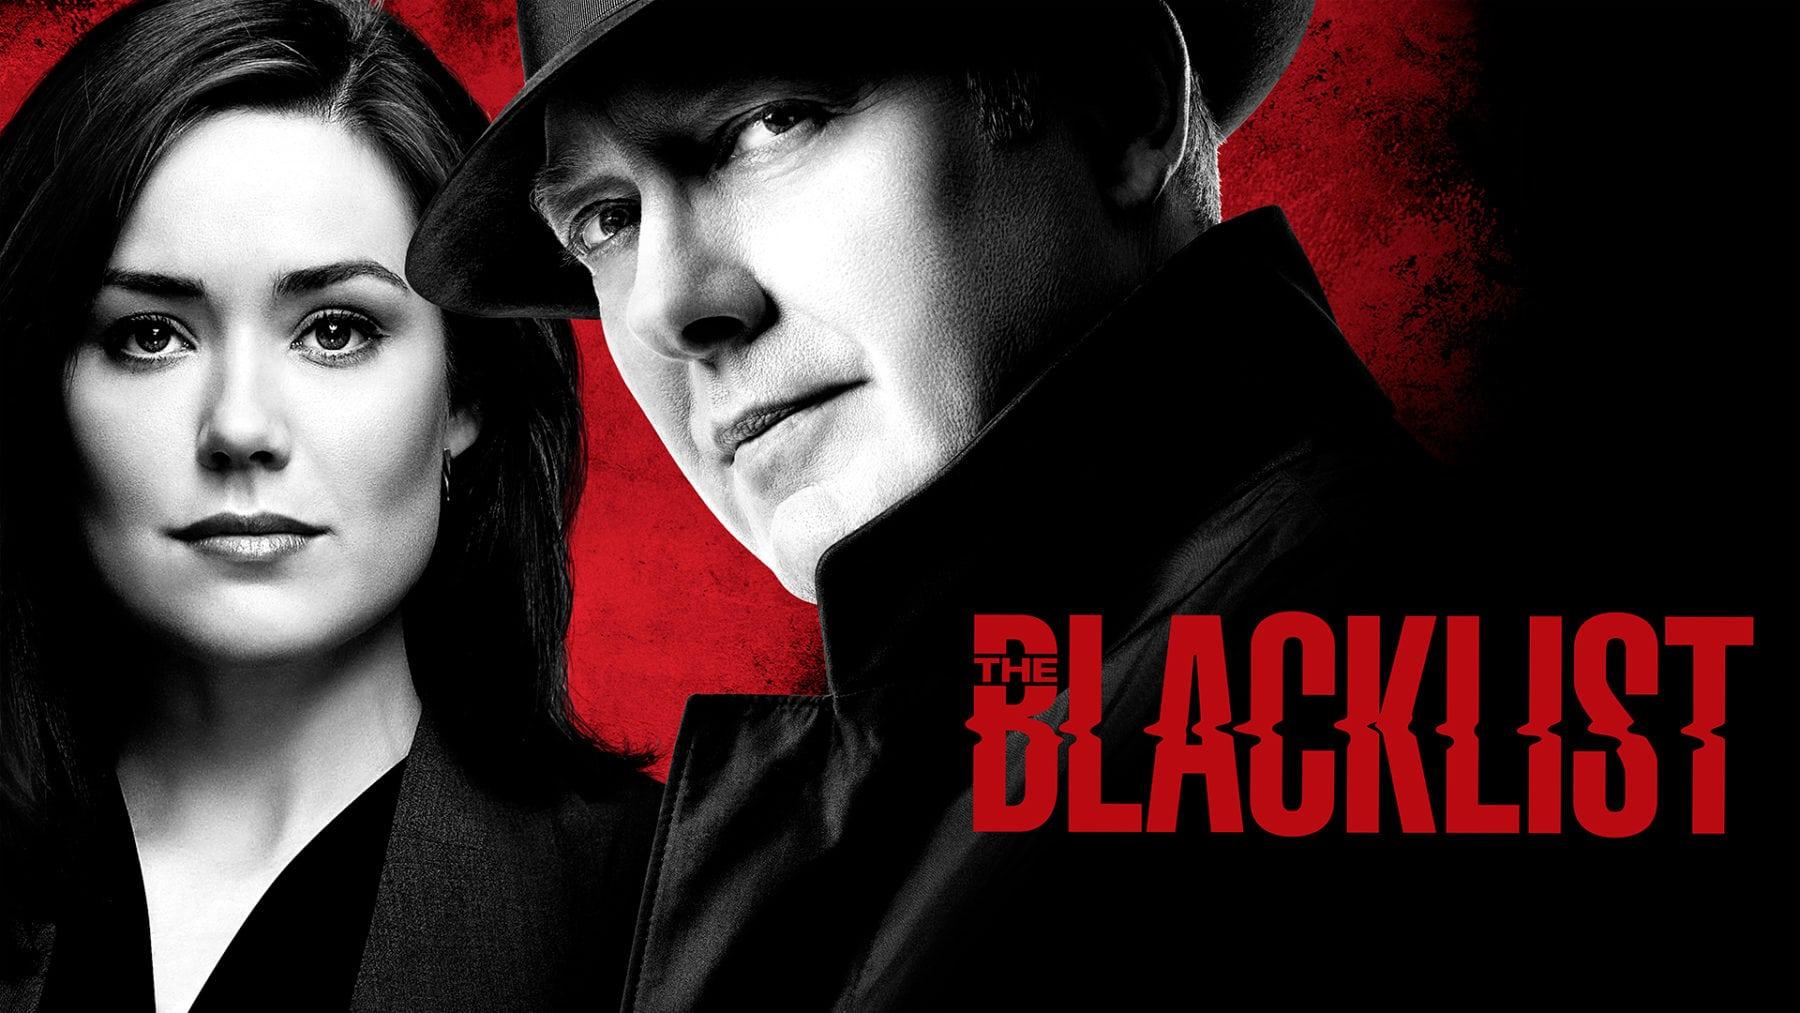 The Blacklist renewed for season 8